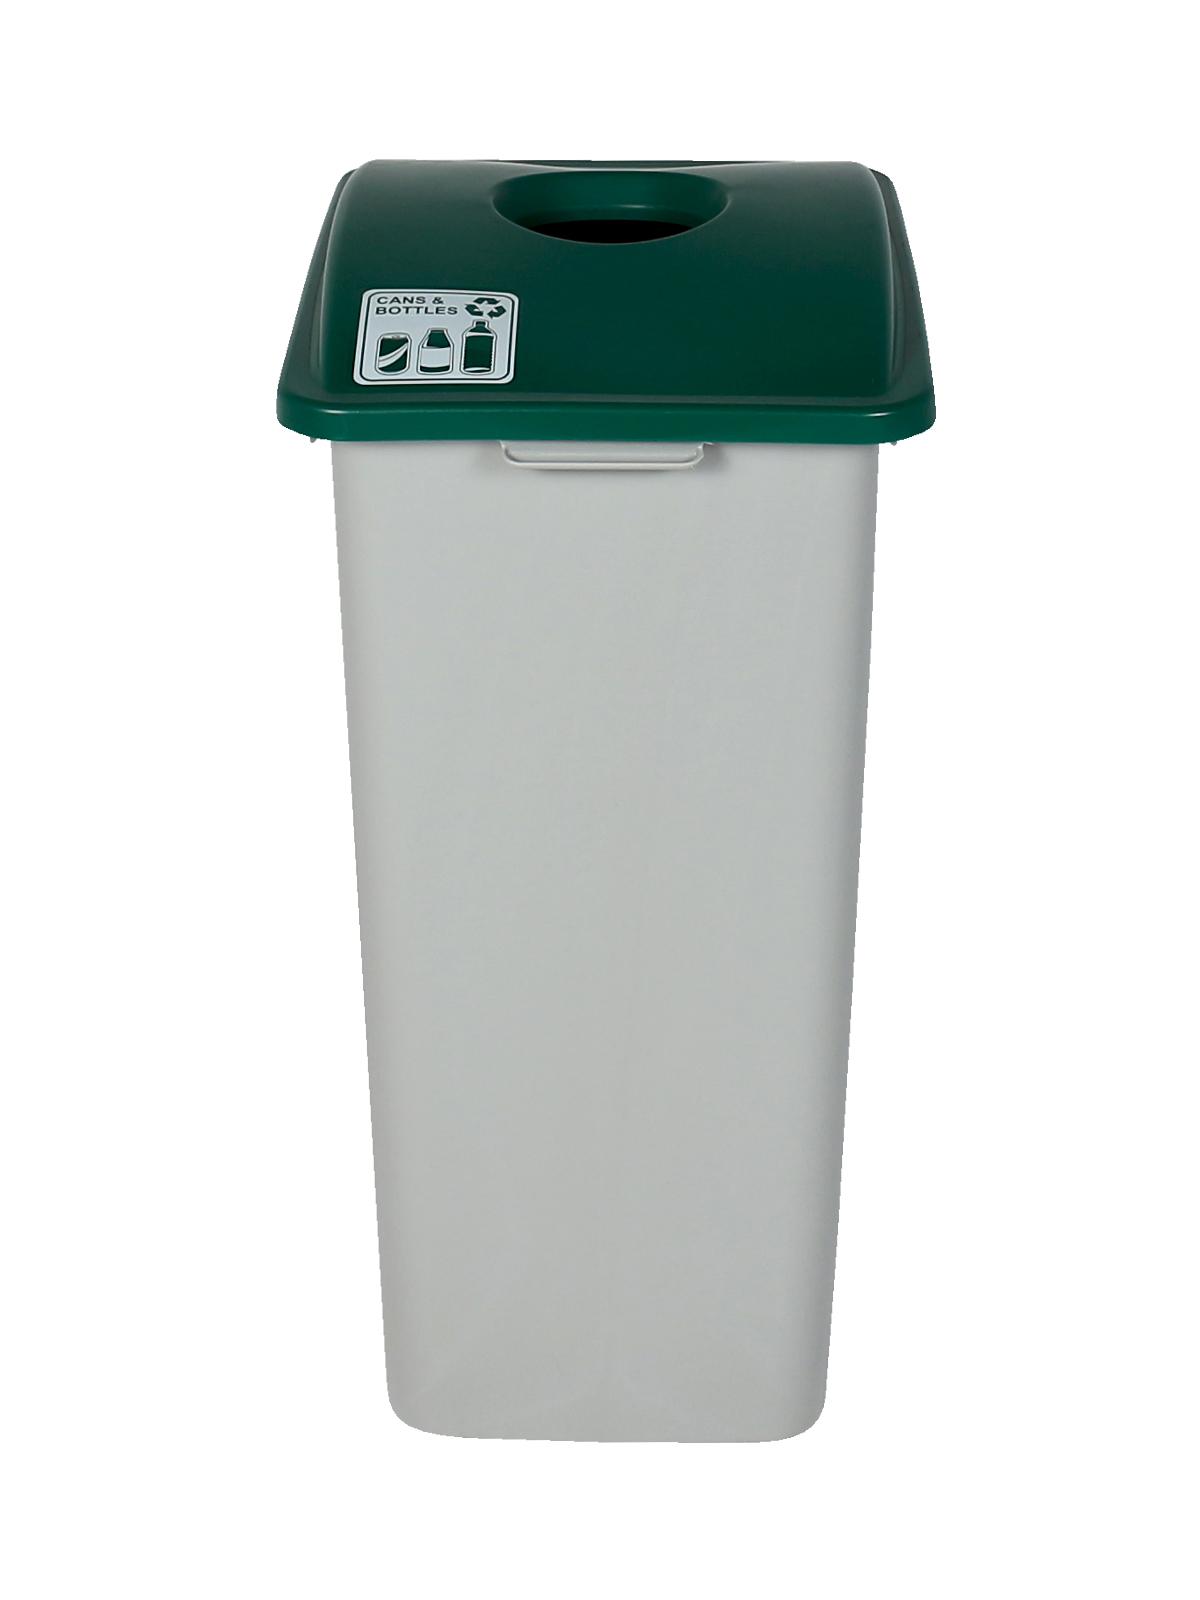 WASTE WATCHER XL - Single - Cans & Bottles - Circle - Grey-Green